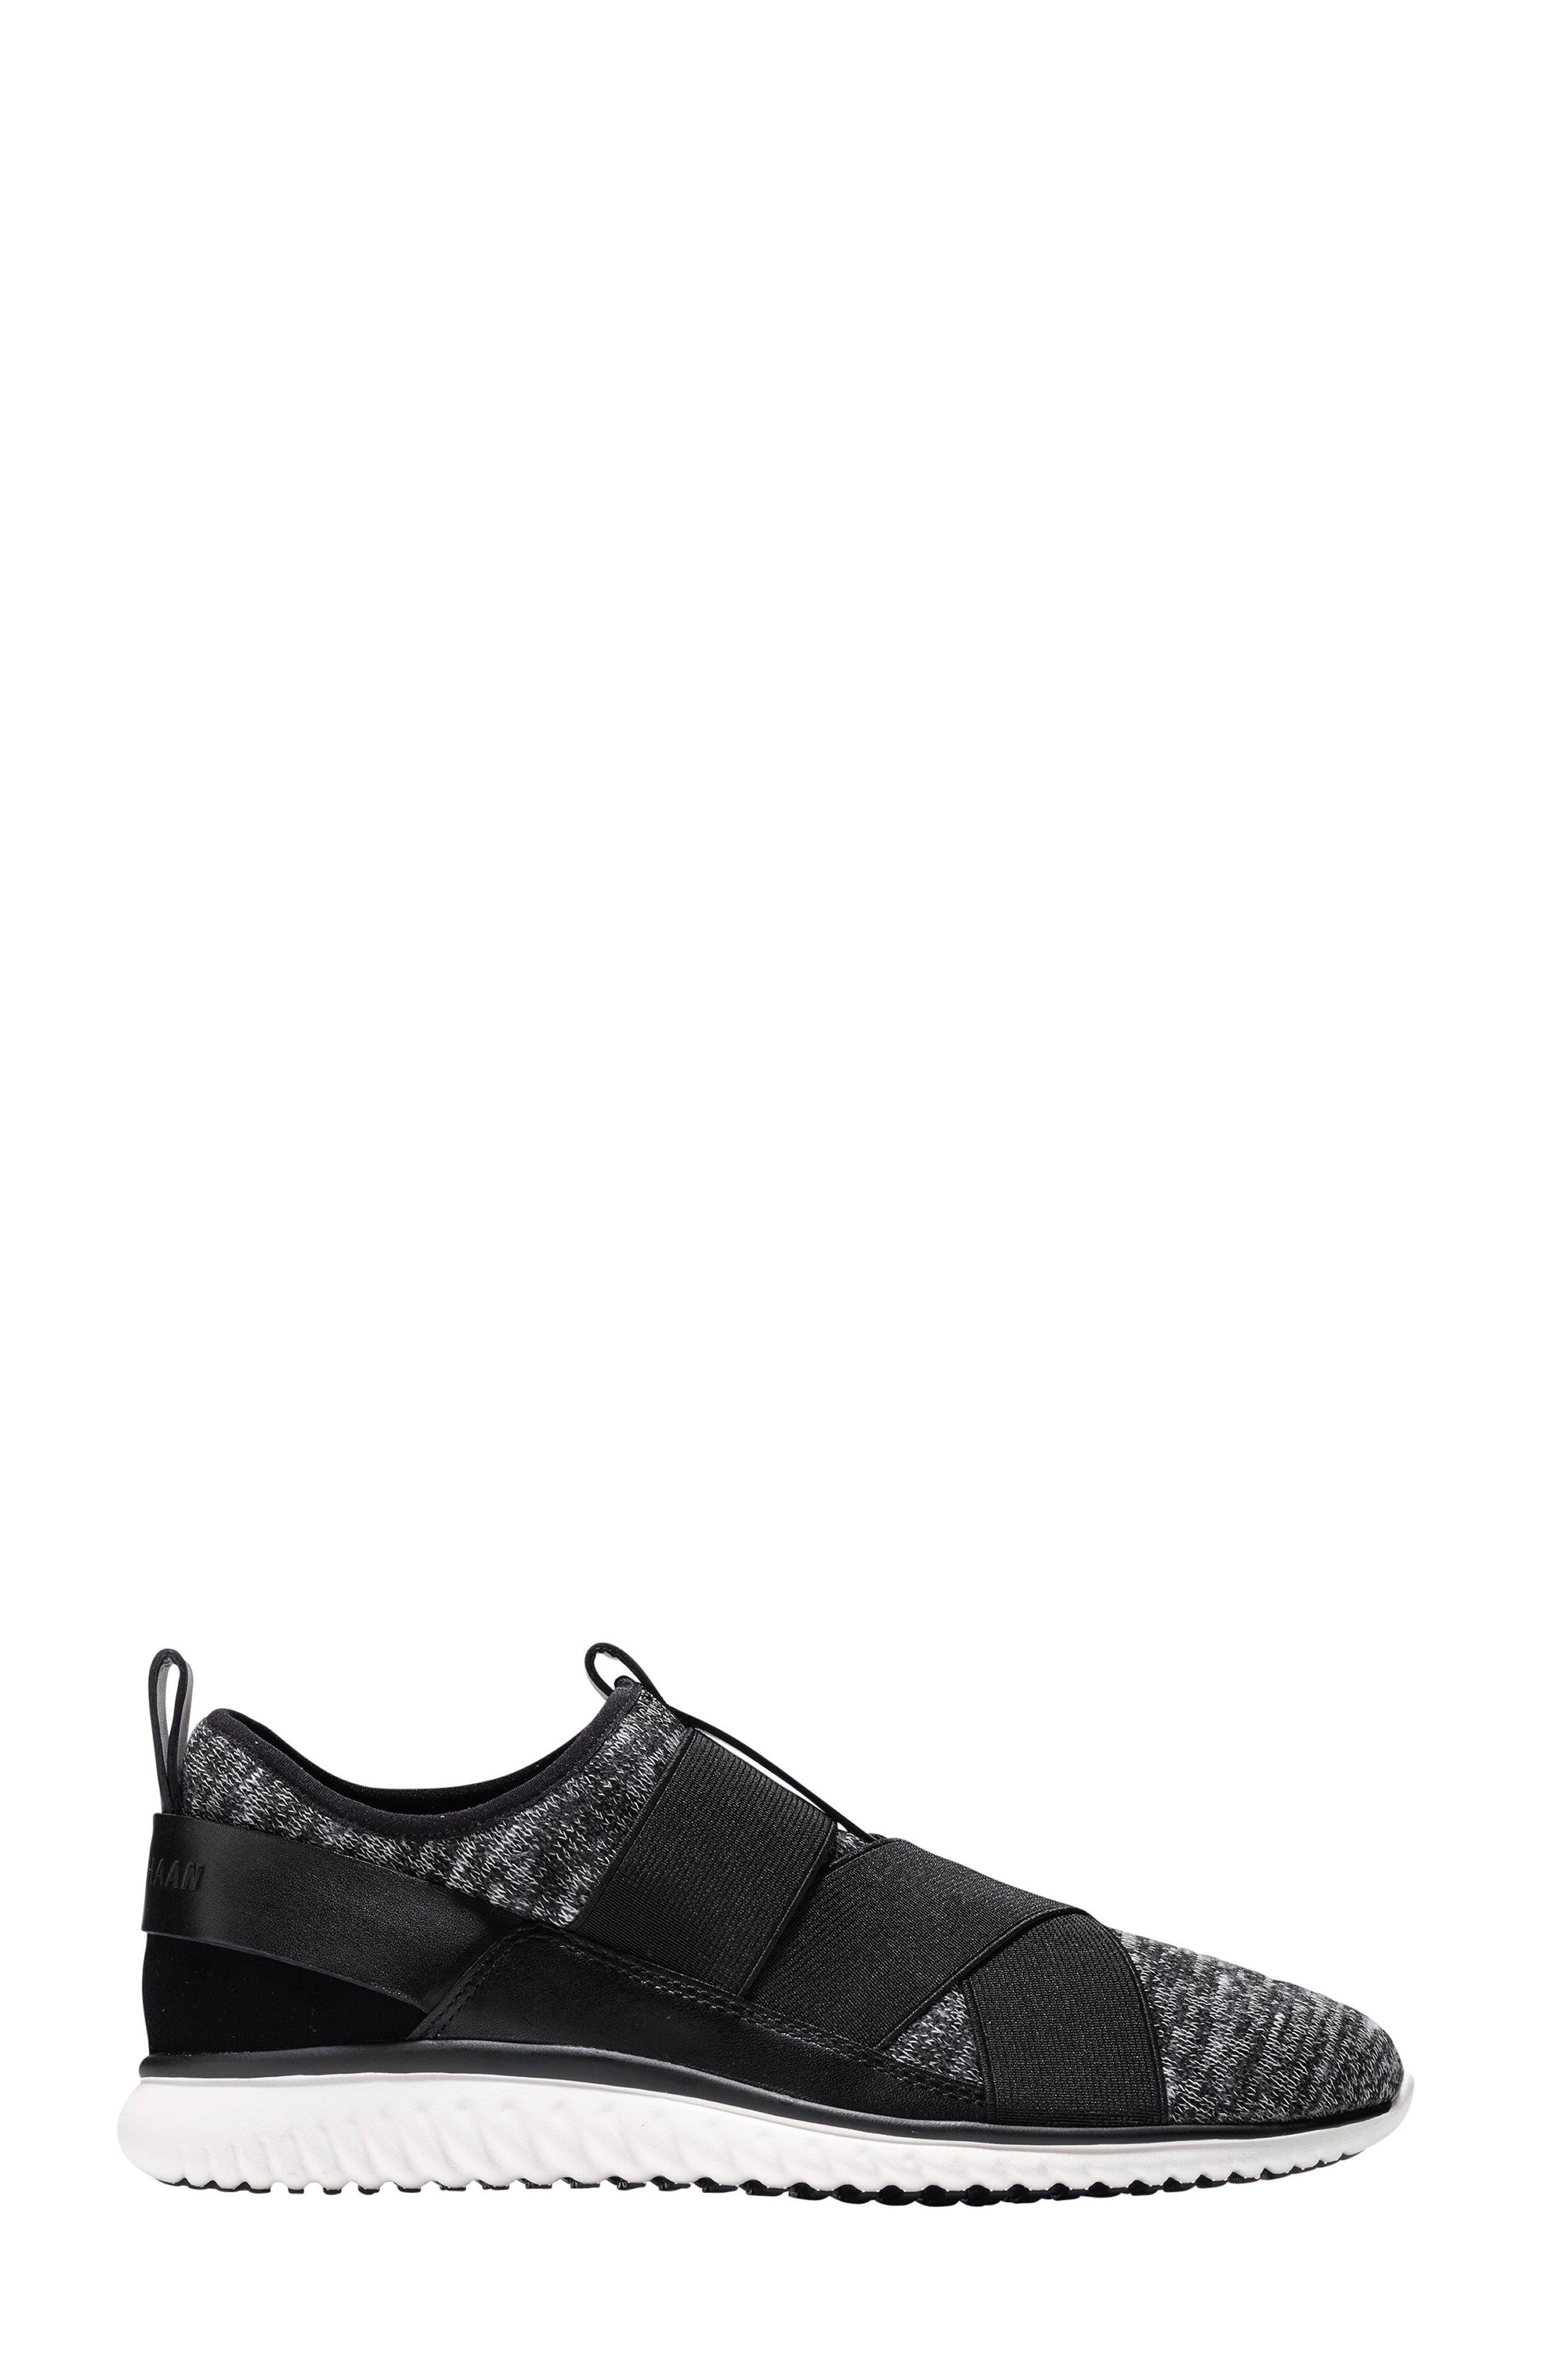 'StudioGrand' Sneaker,                             Alternate thumbnail 3, color,                             002